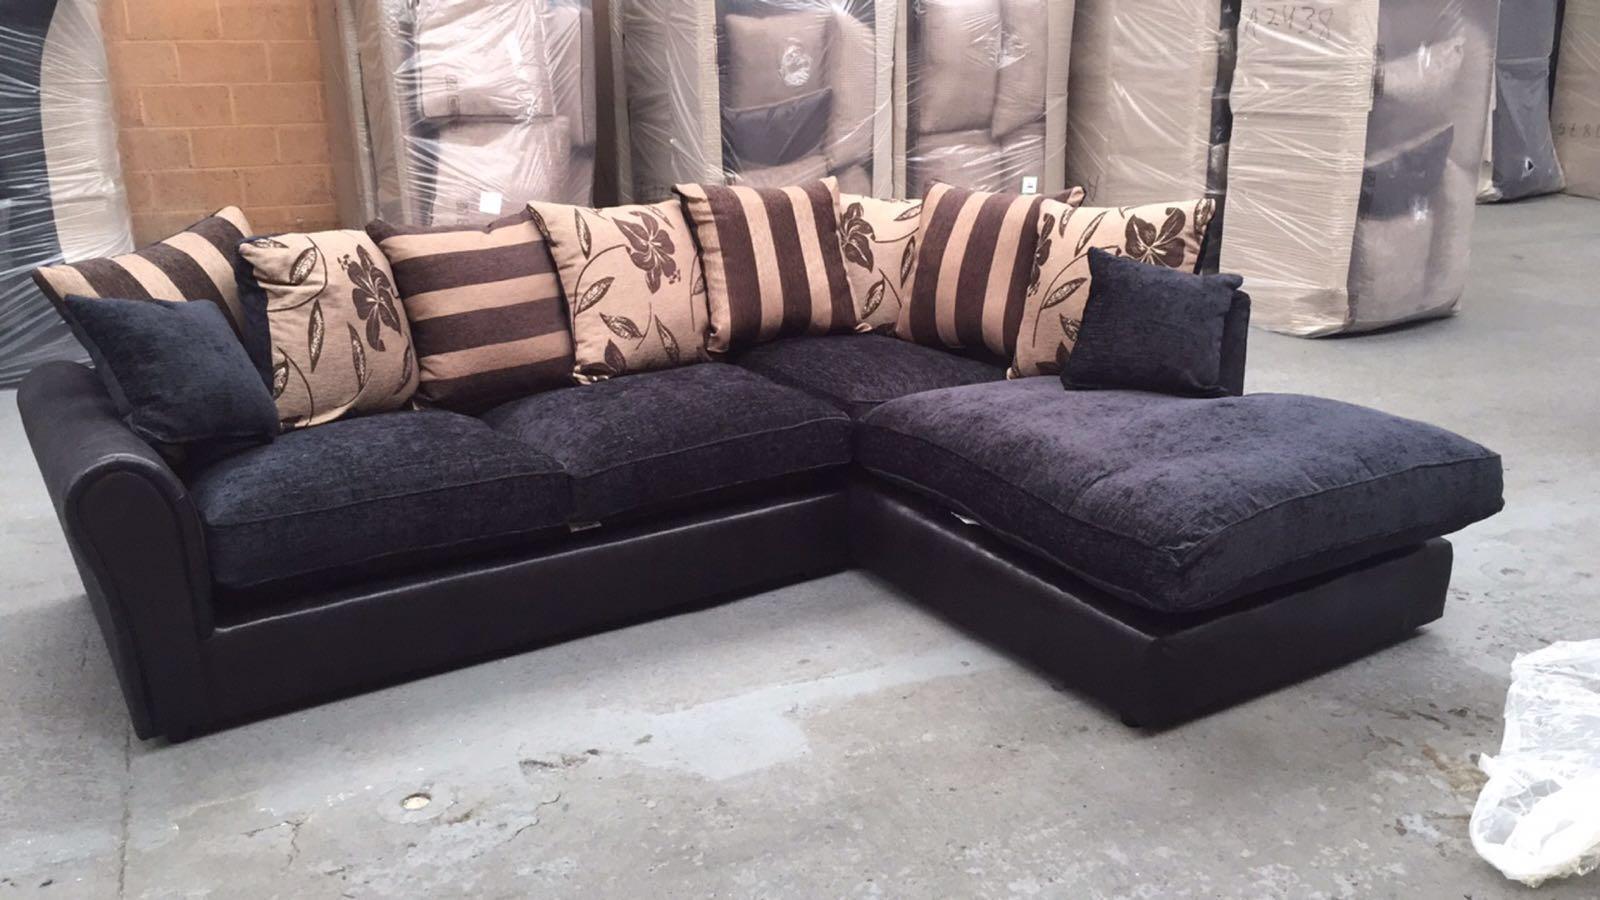 20 choices of black corner sofas sofa ideas. Black Bedroom Furniture Sets. Home Design Ideas